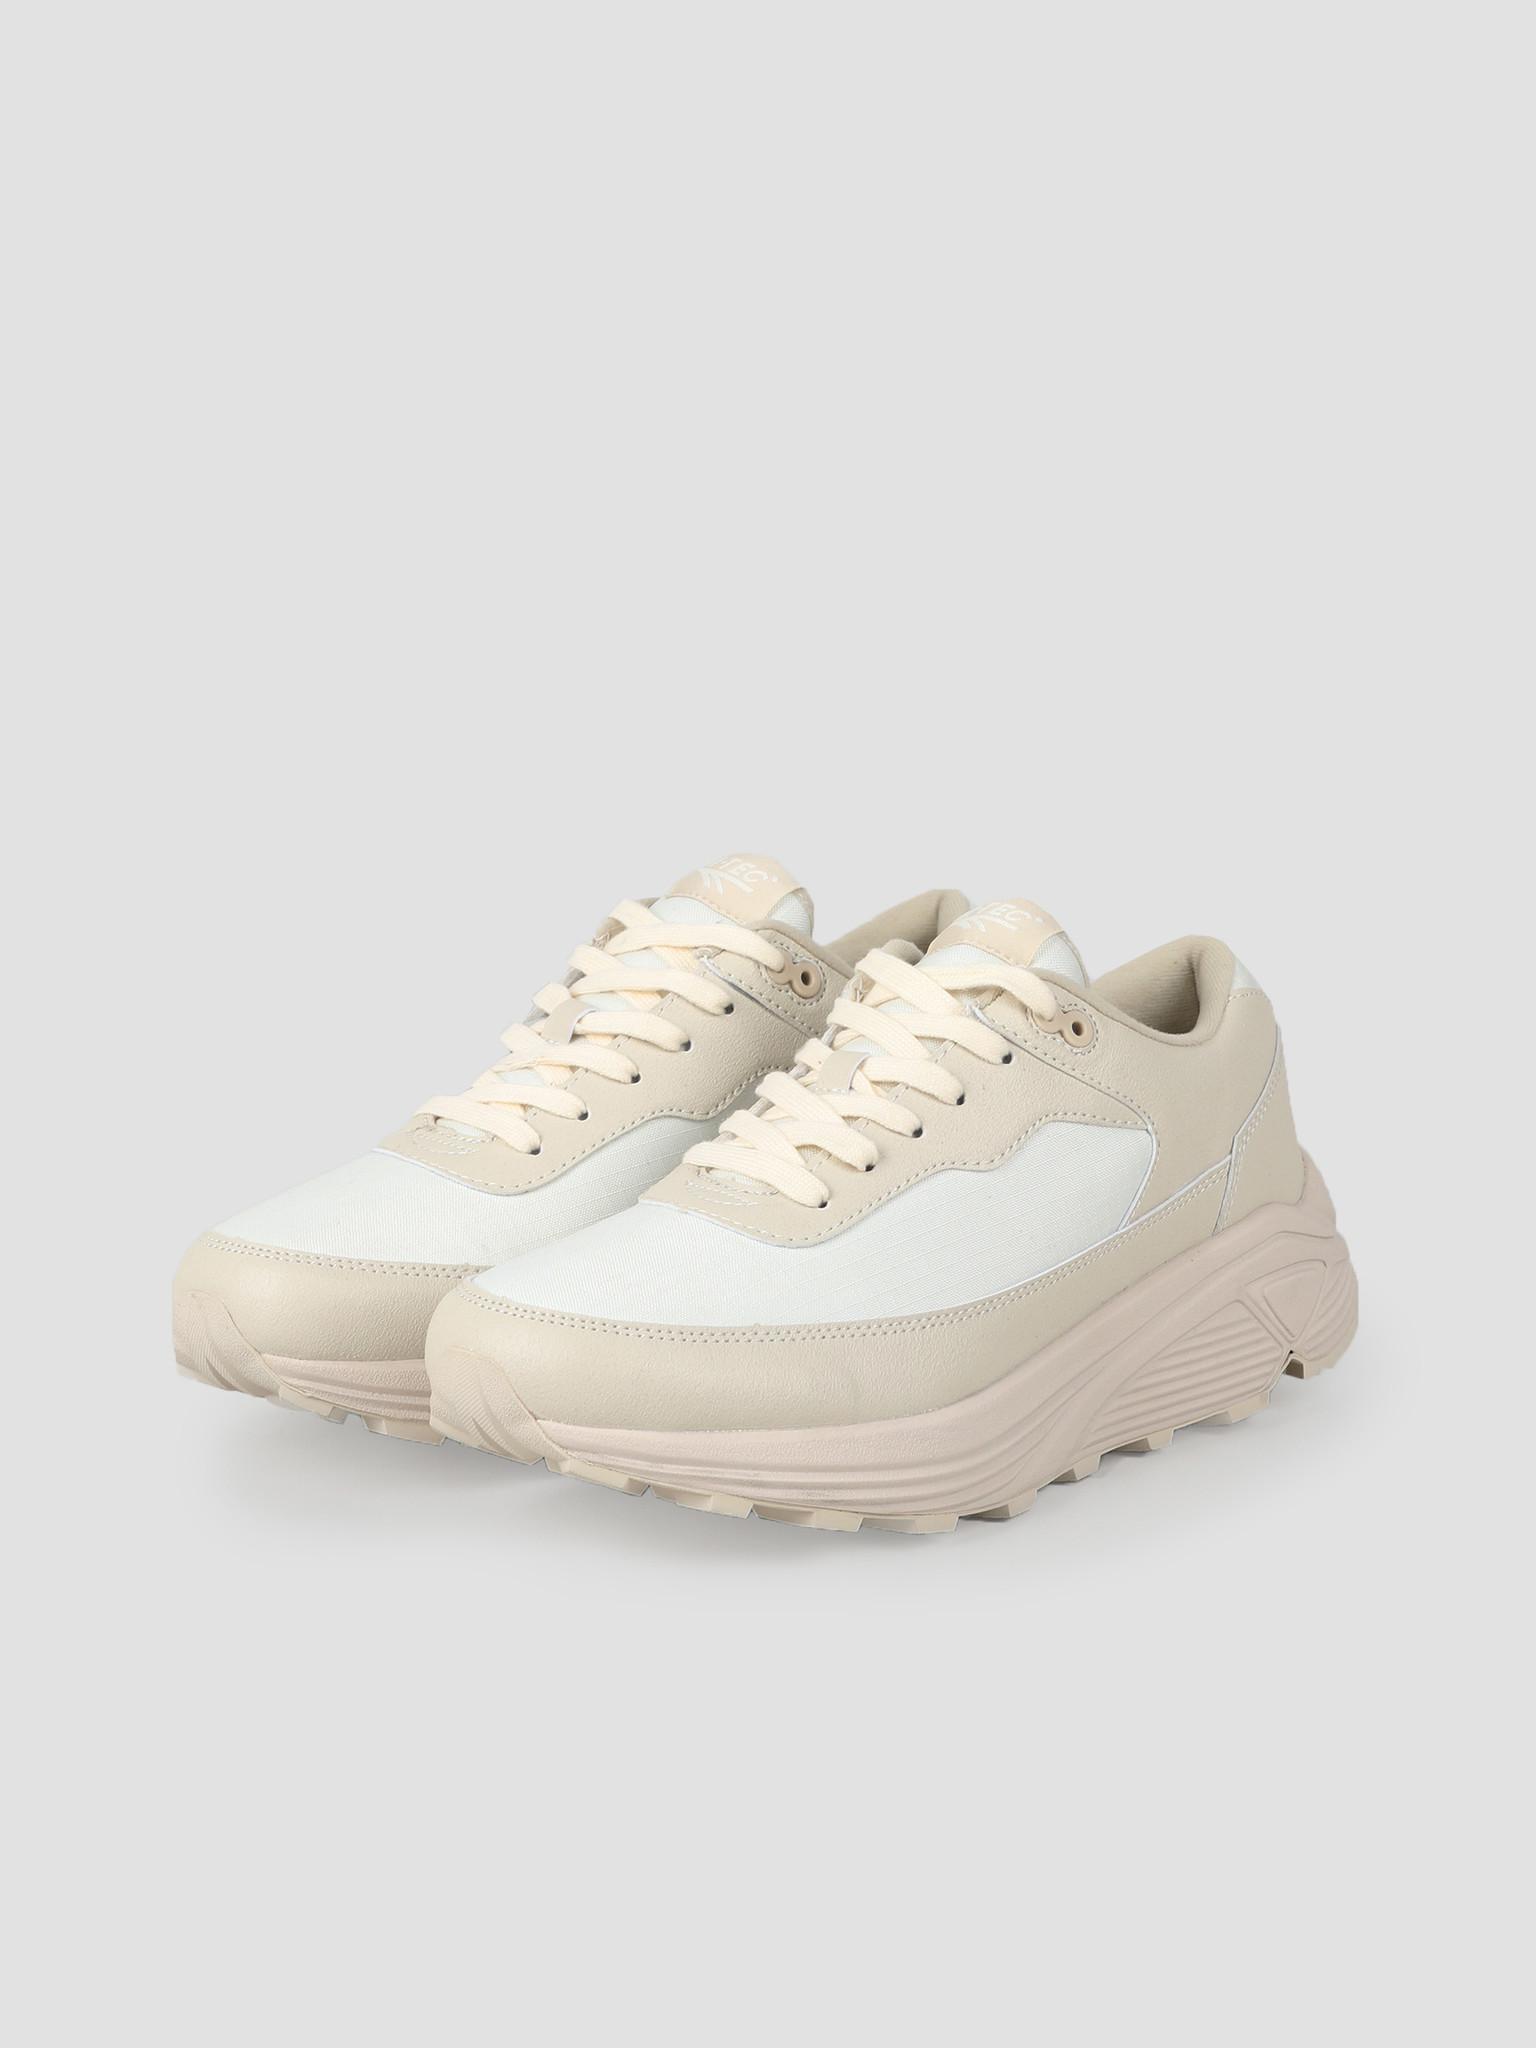 Hi-Tec Hi-Tec HTS Walk Lite Beige Off White K010008-011